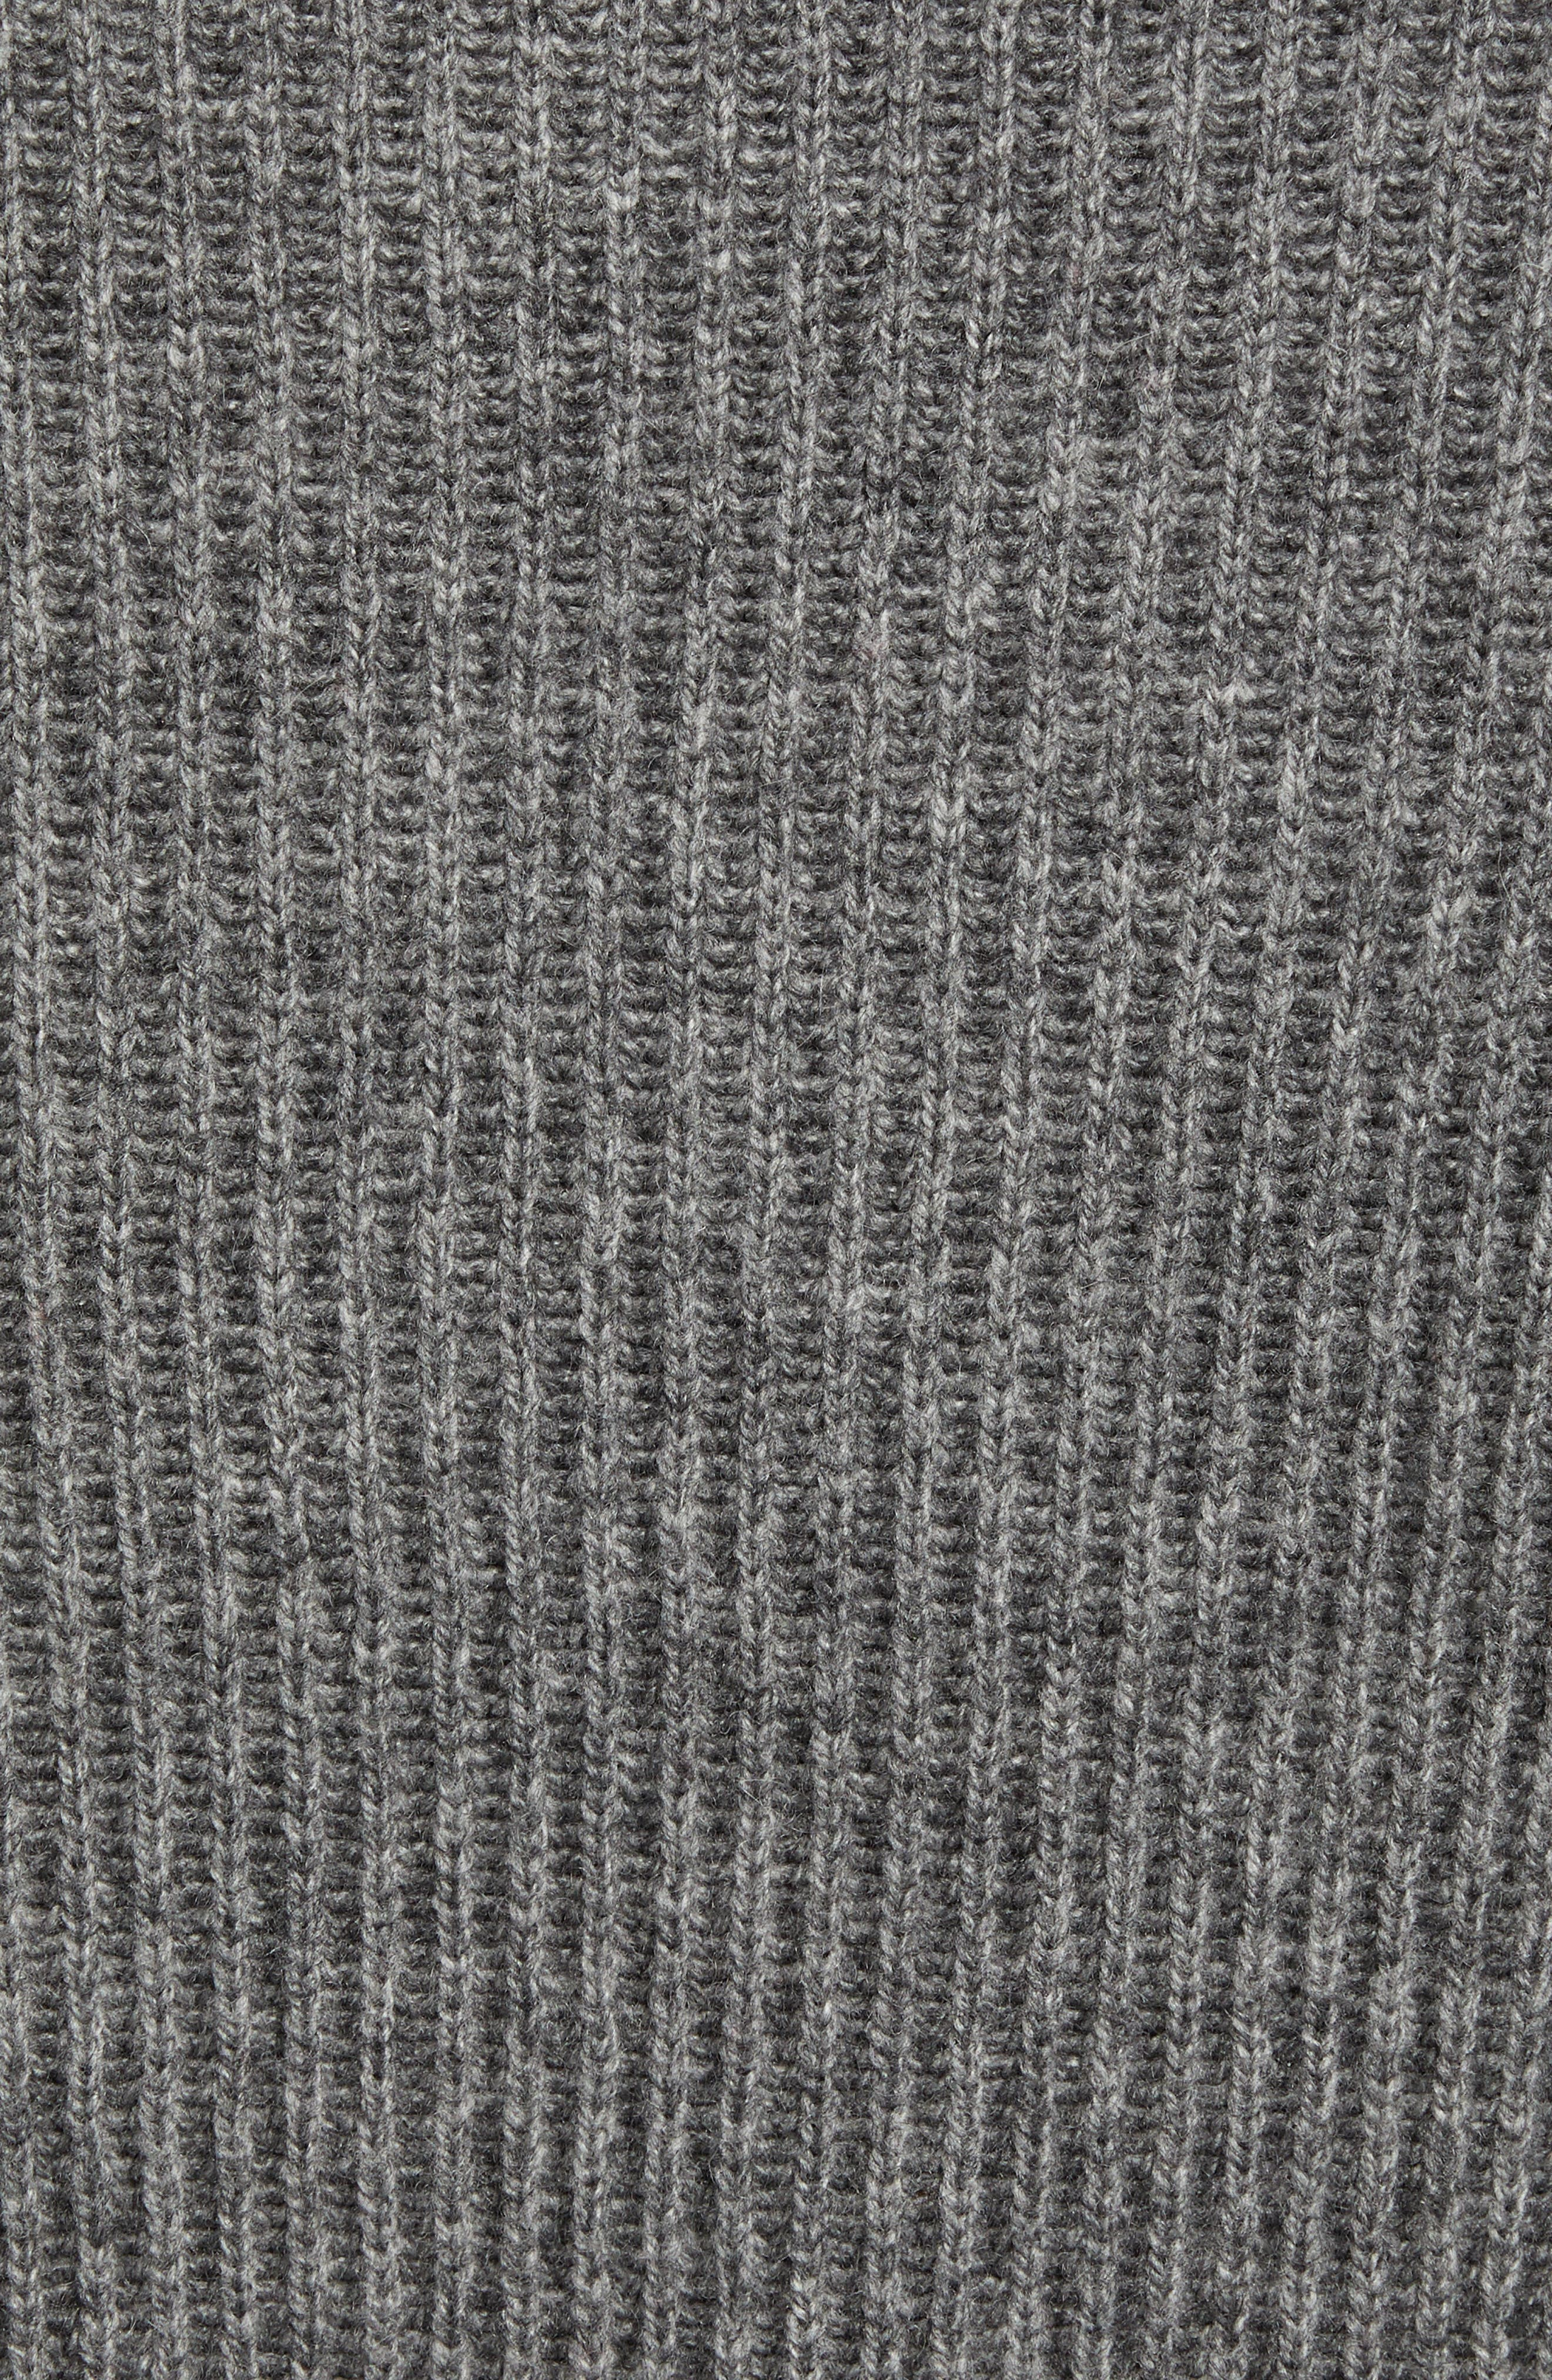 Mountainside Wool Blend Shawl Sweater,                             Alternate thumbnail 5, color,                             GREY